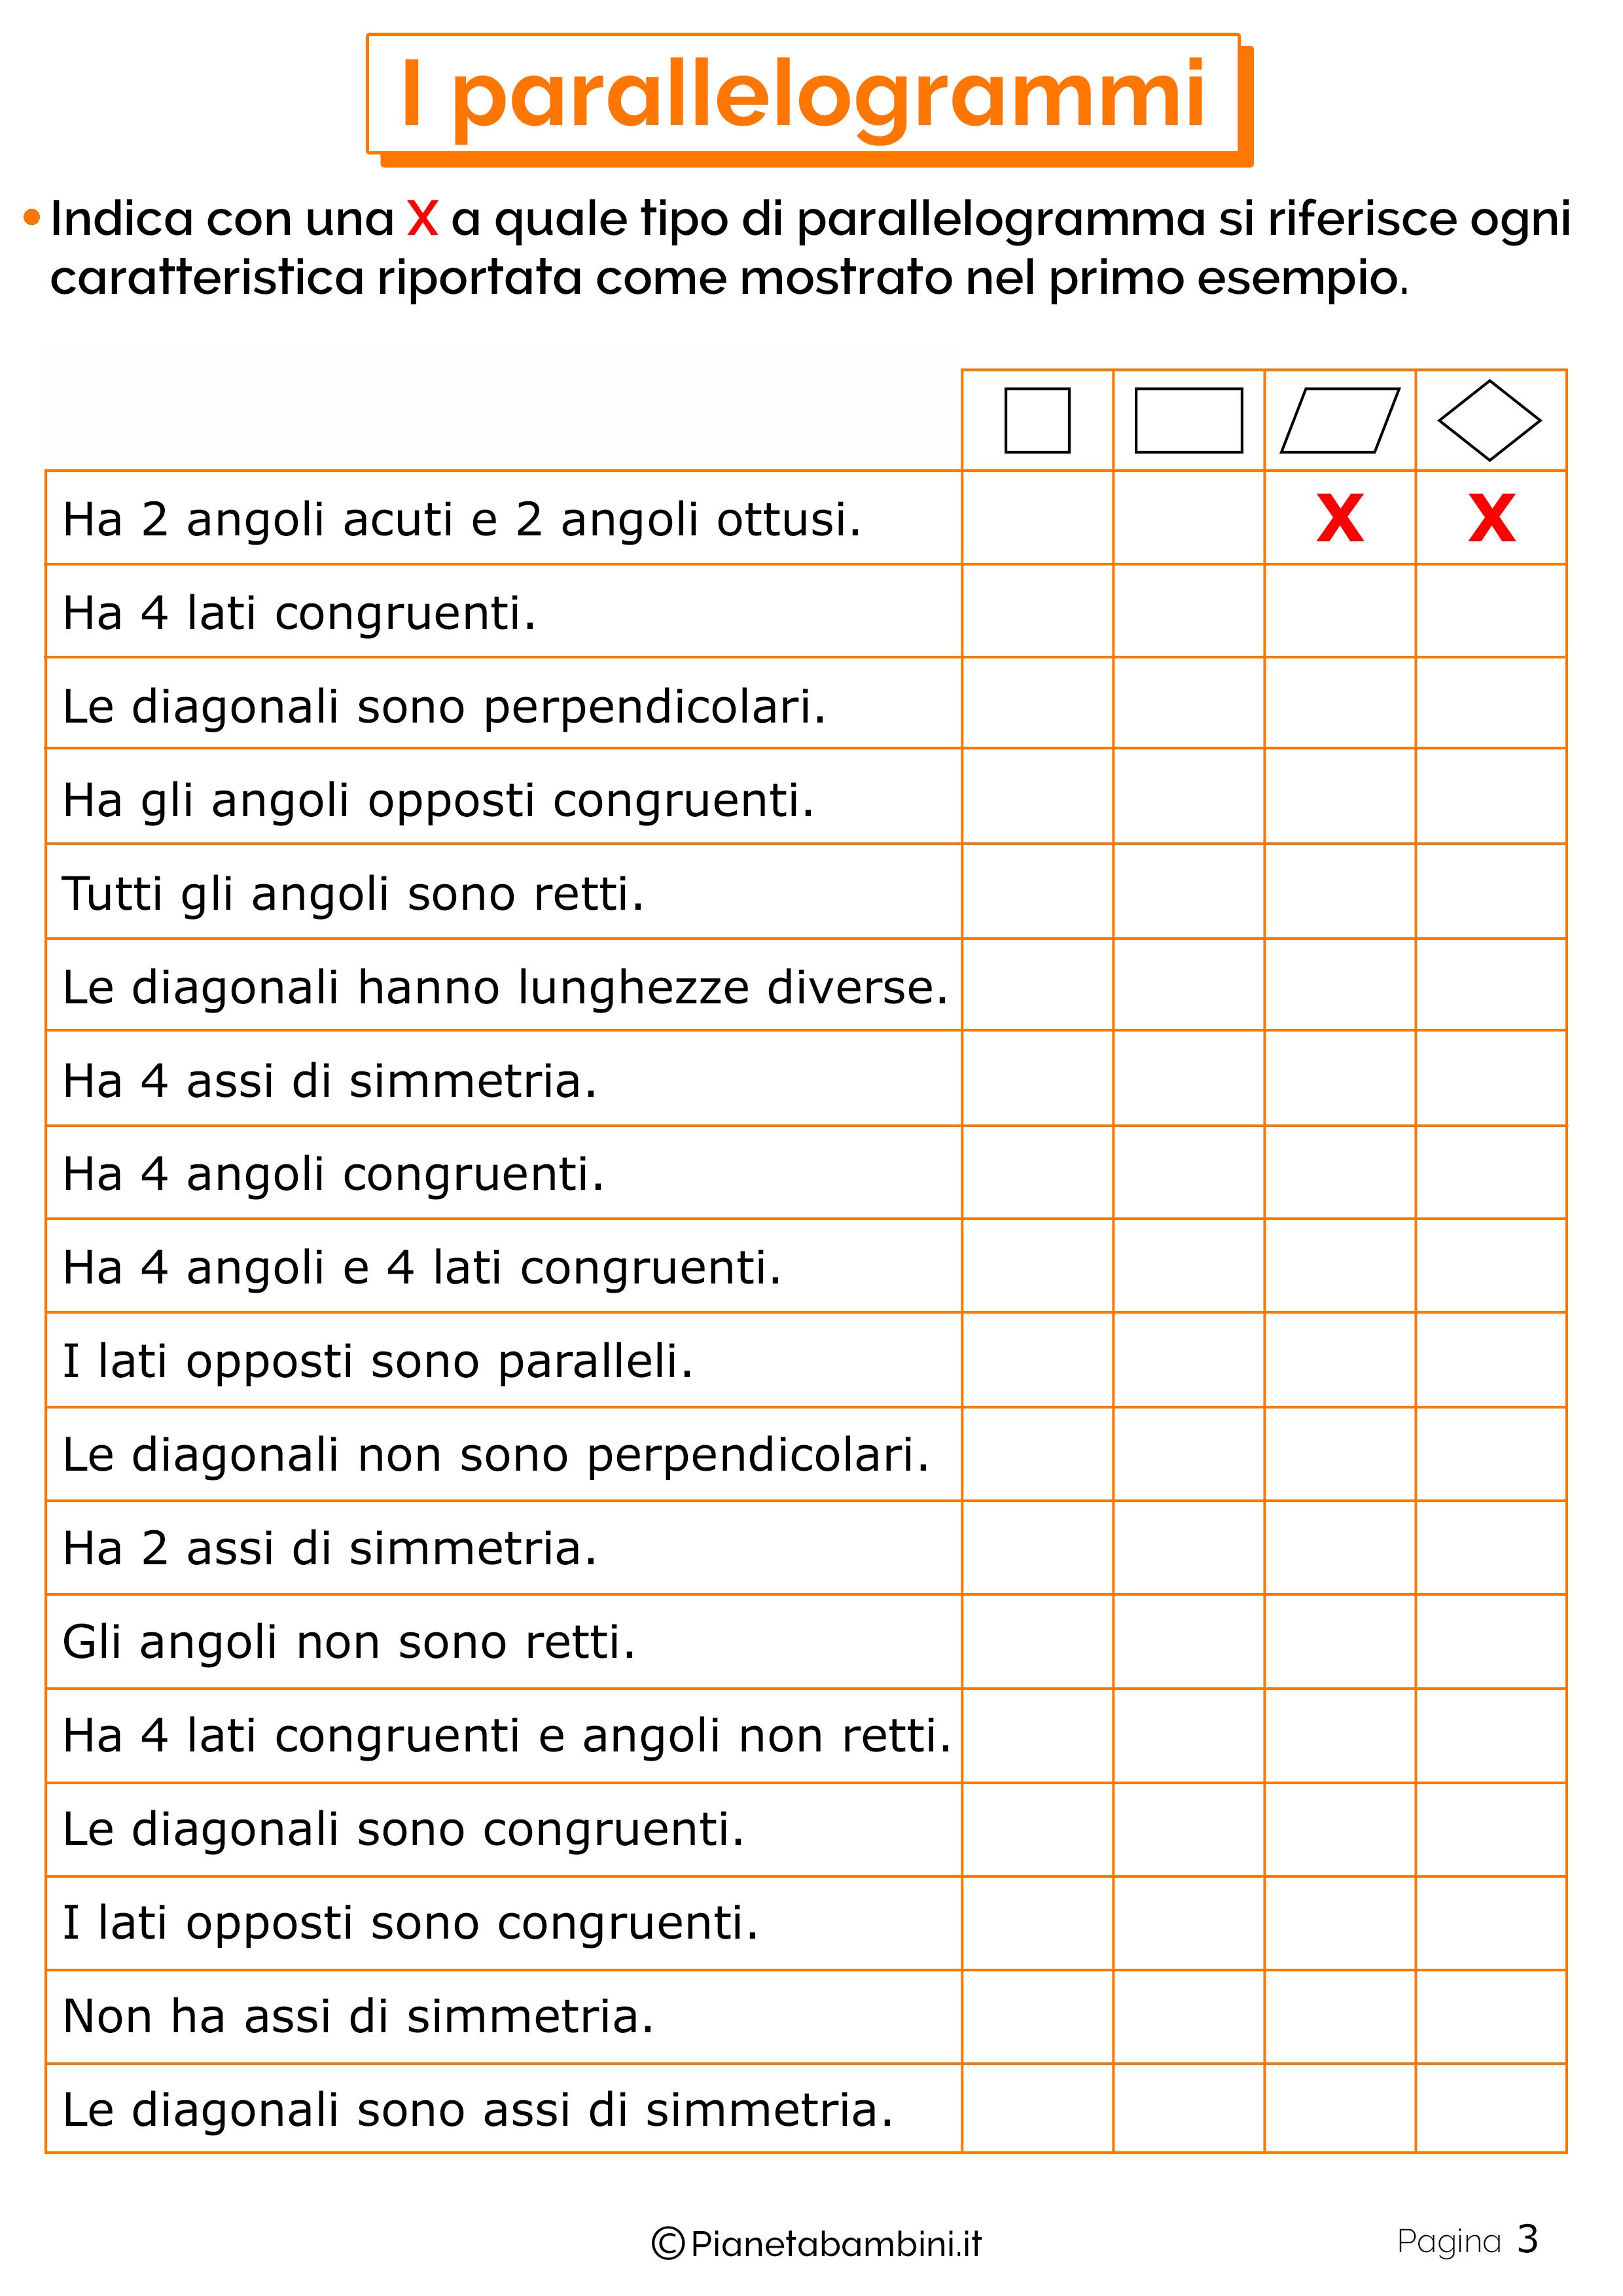 Schede didattiche sui parallelogrammi 3